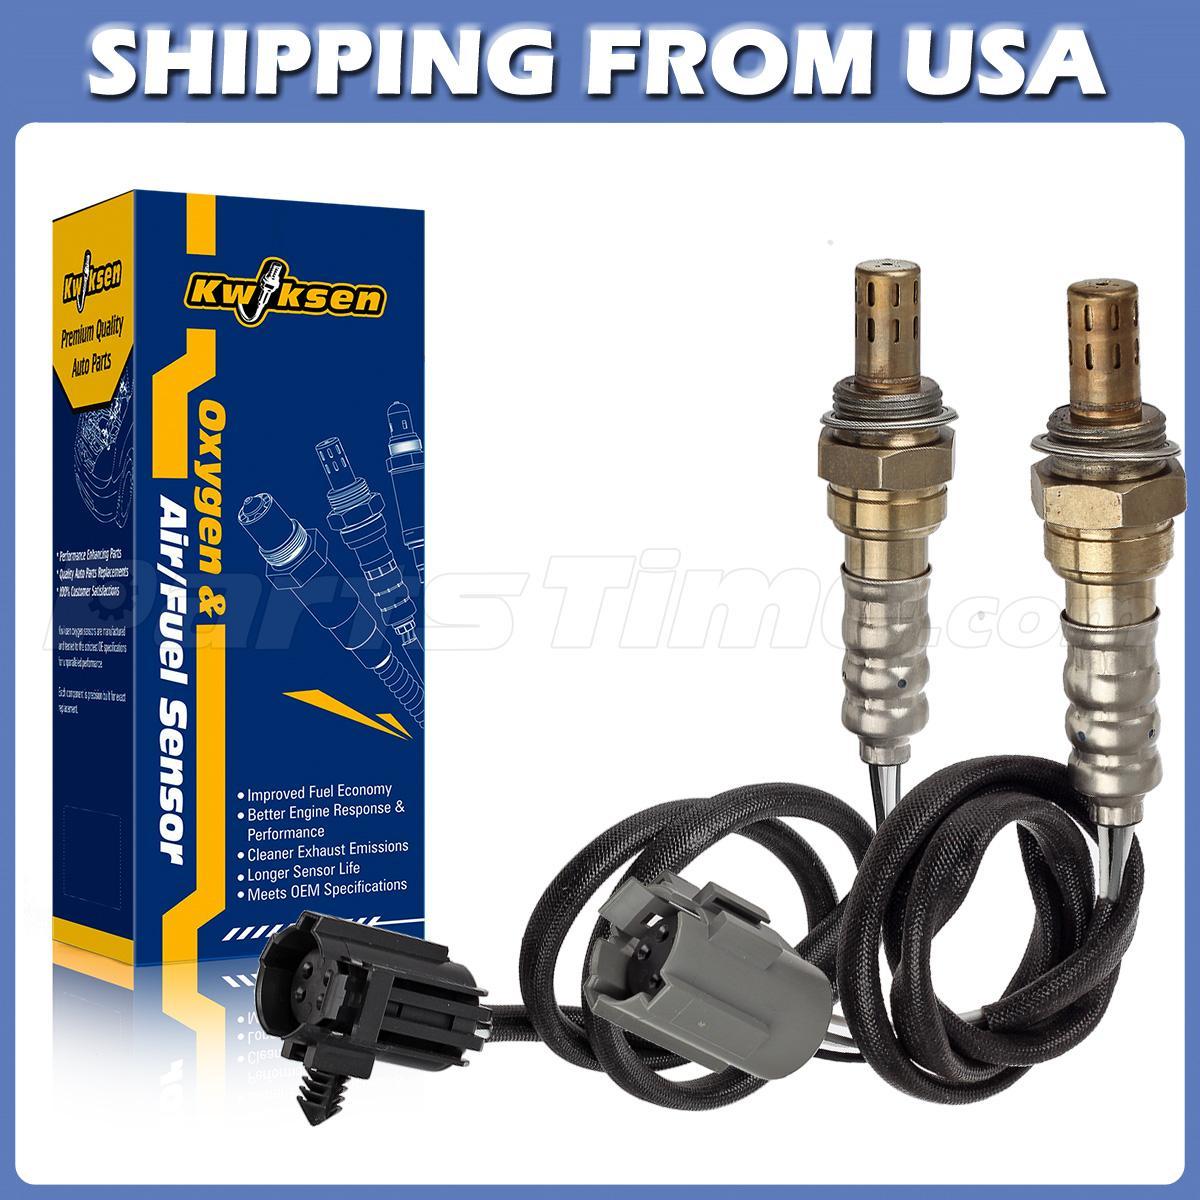 Wiring Harness Plugs For 2008 Dodge 2500 02 Sensor 50 Ram 3500 1500 128719 1pd2hvbgvjzwxszxj1c2est Upstream Downstream O2 Oxygen